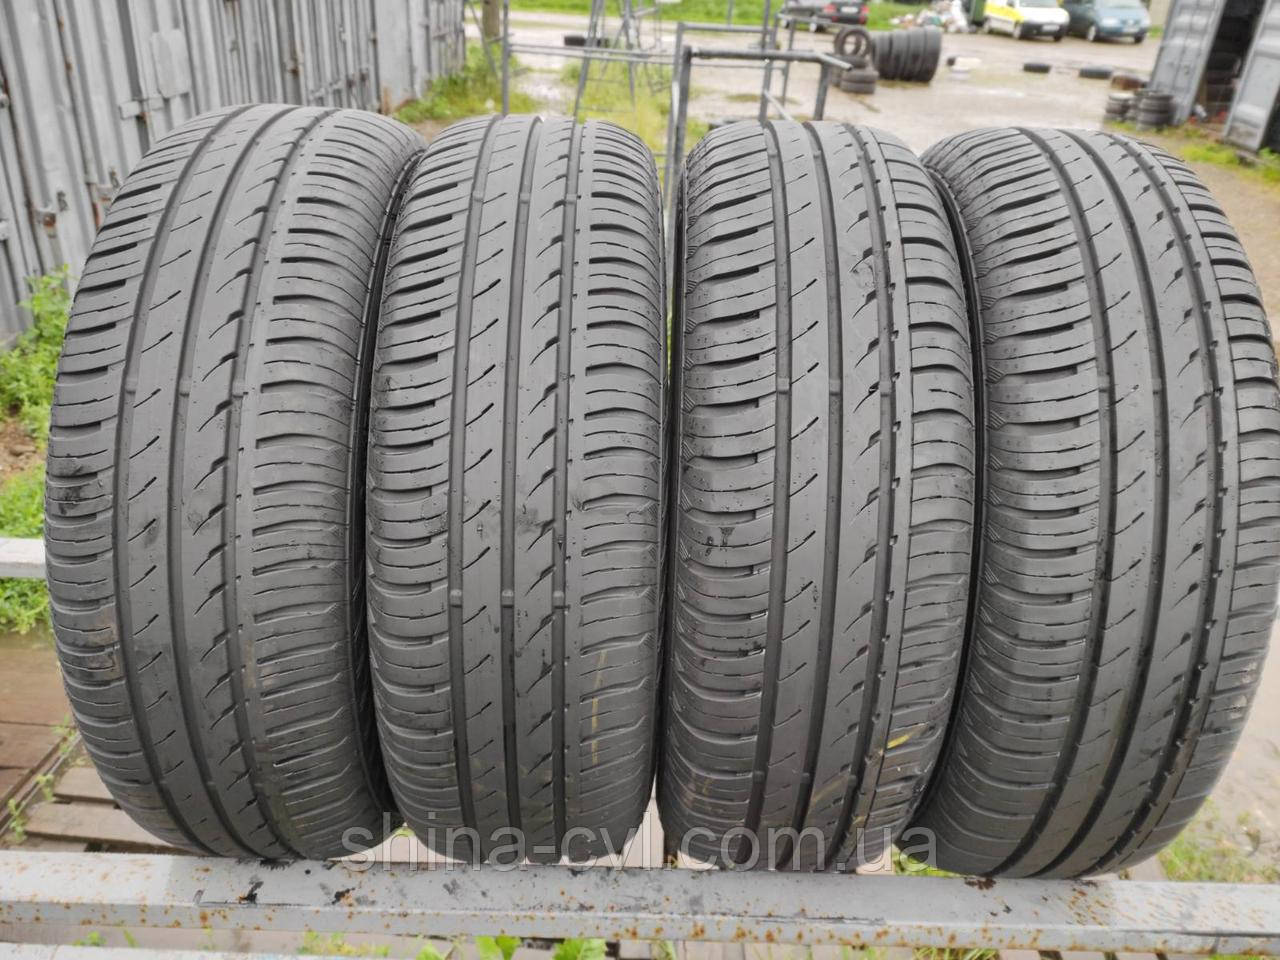 Літні шини 195/65 R15 91T CONTINENTAL CONTI ECO CONTACT